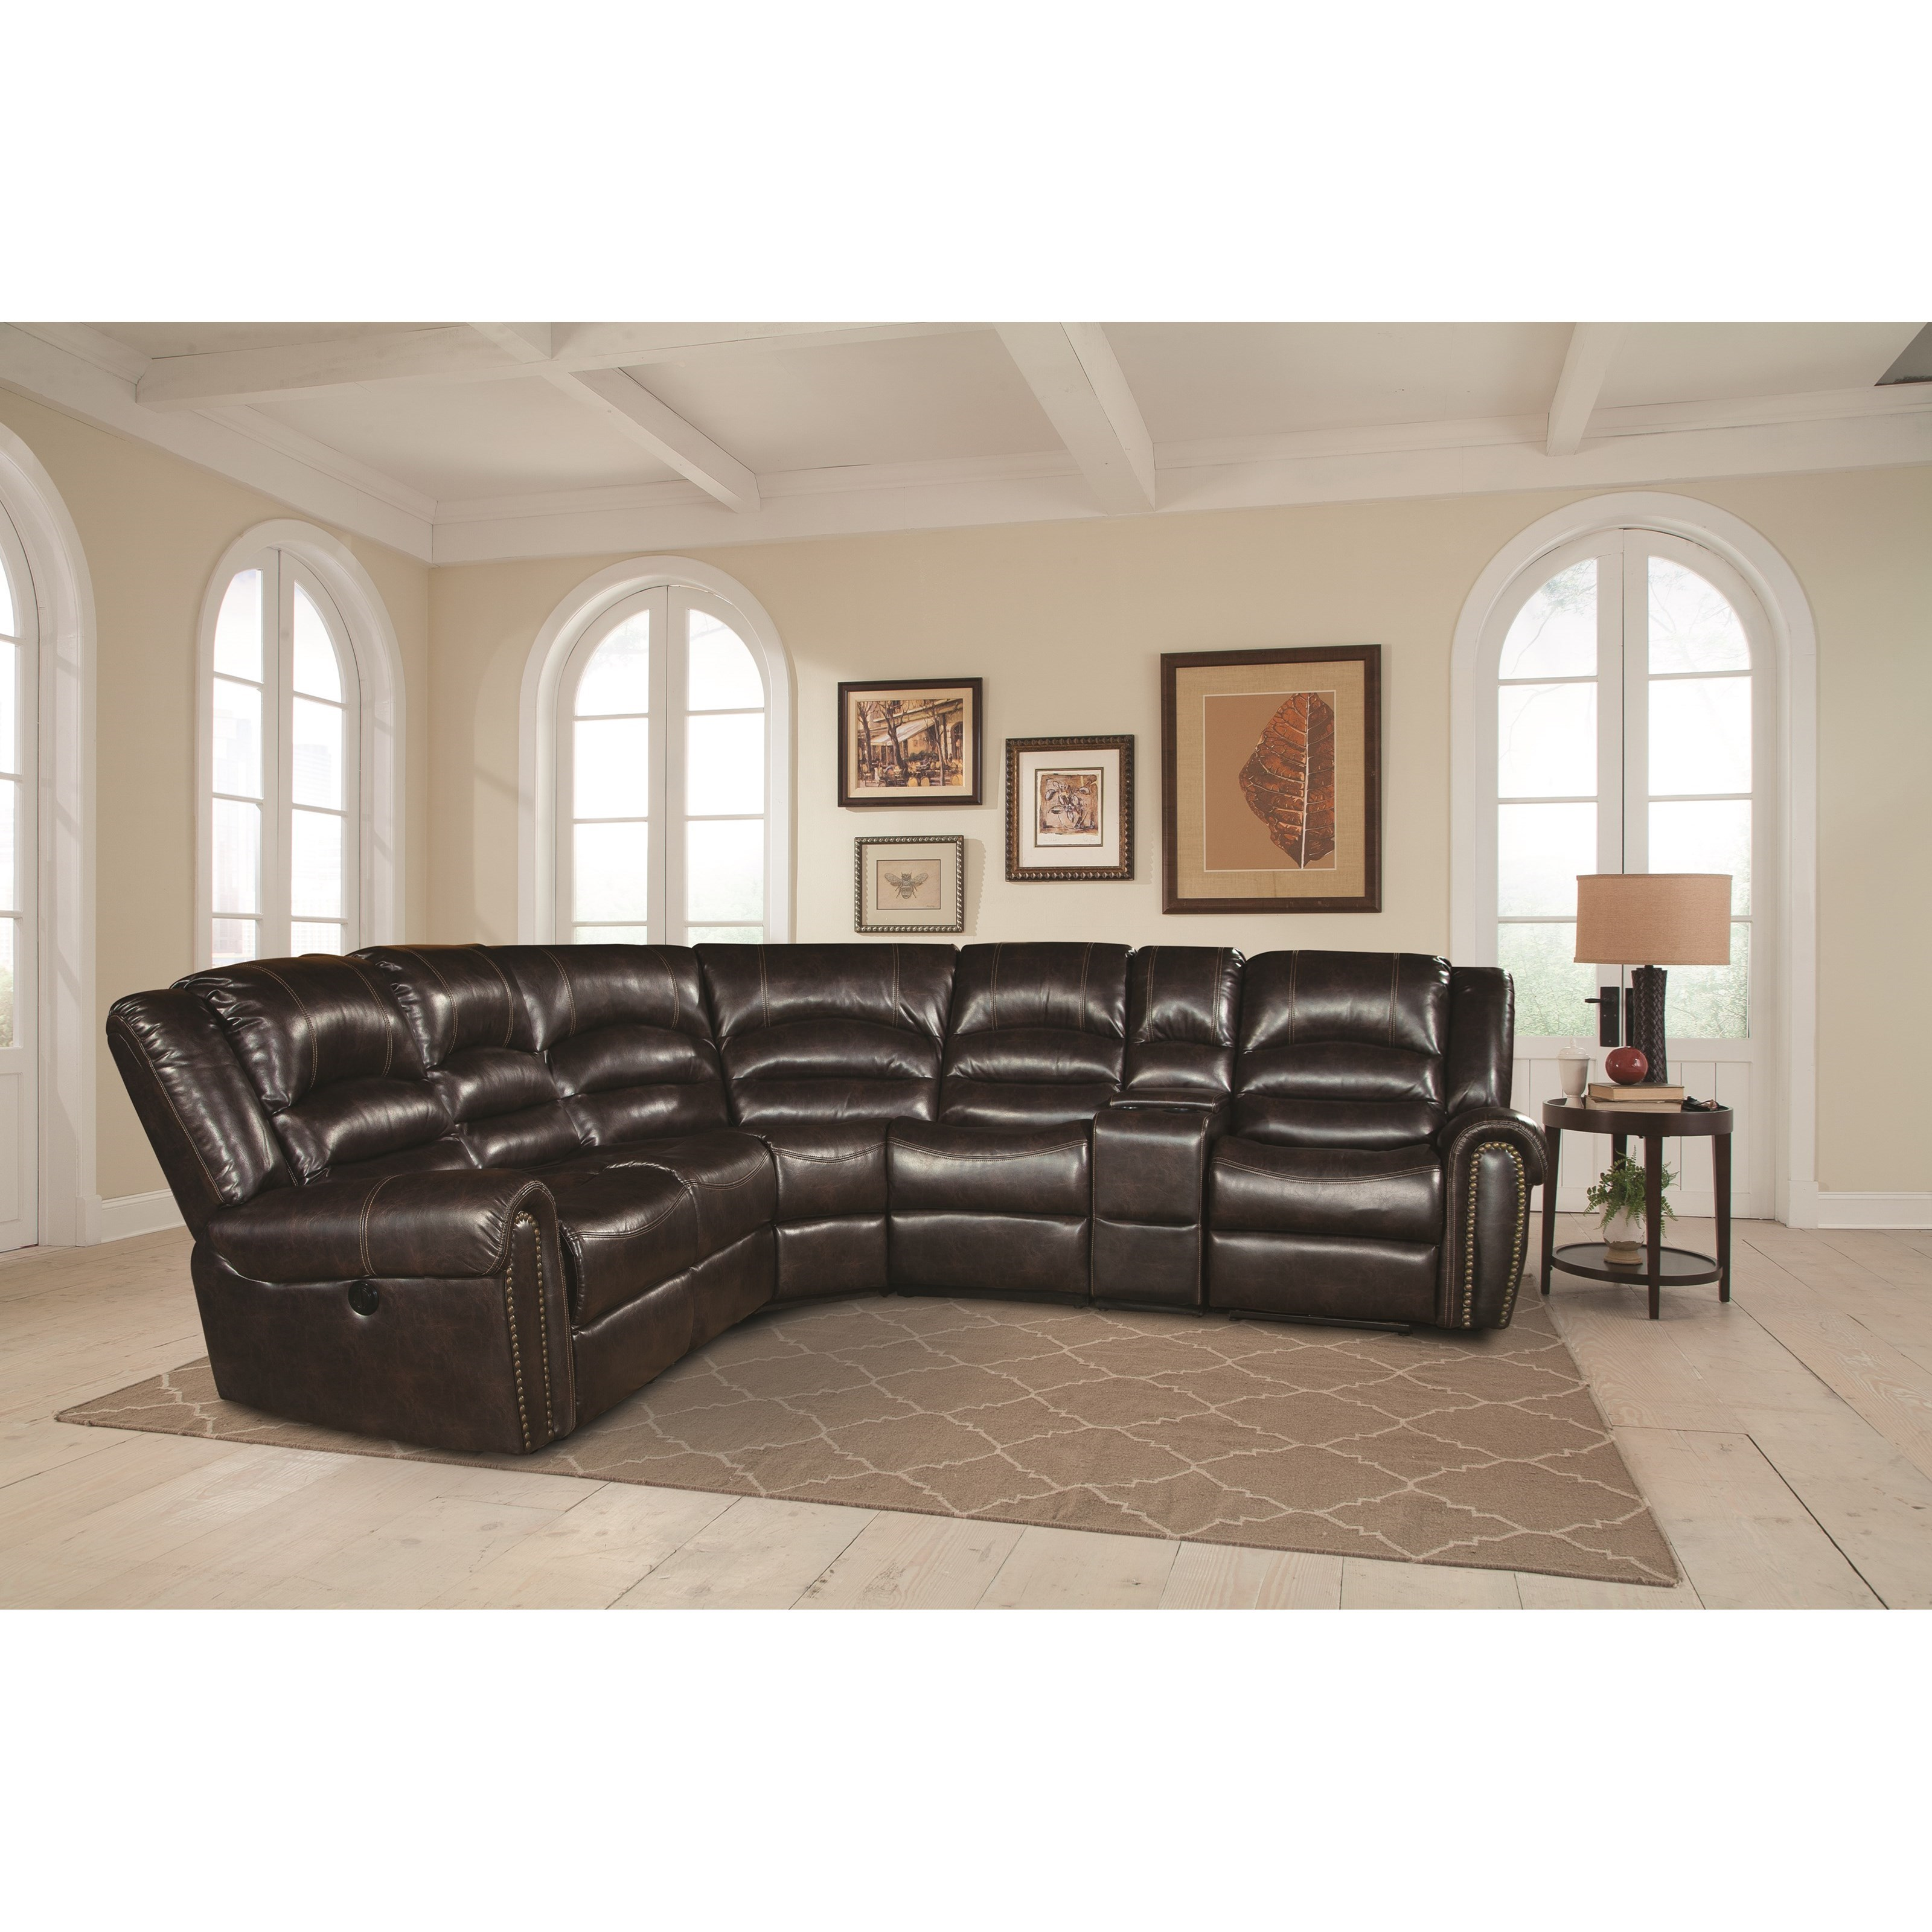 Parker Living Gershwin Sectional Sofa - Item Number: MGER-PACKM-JA